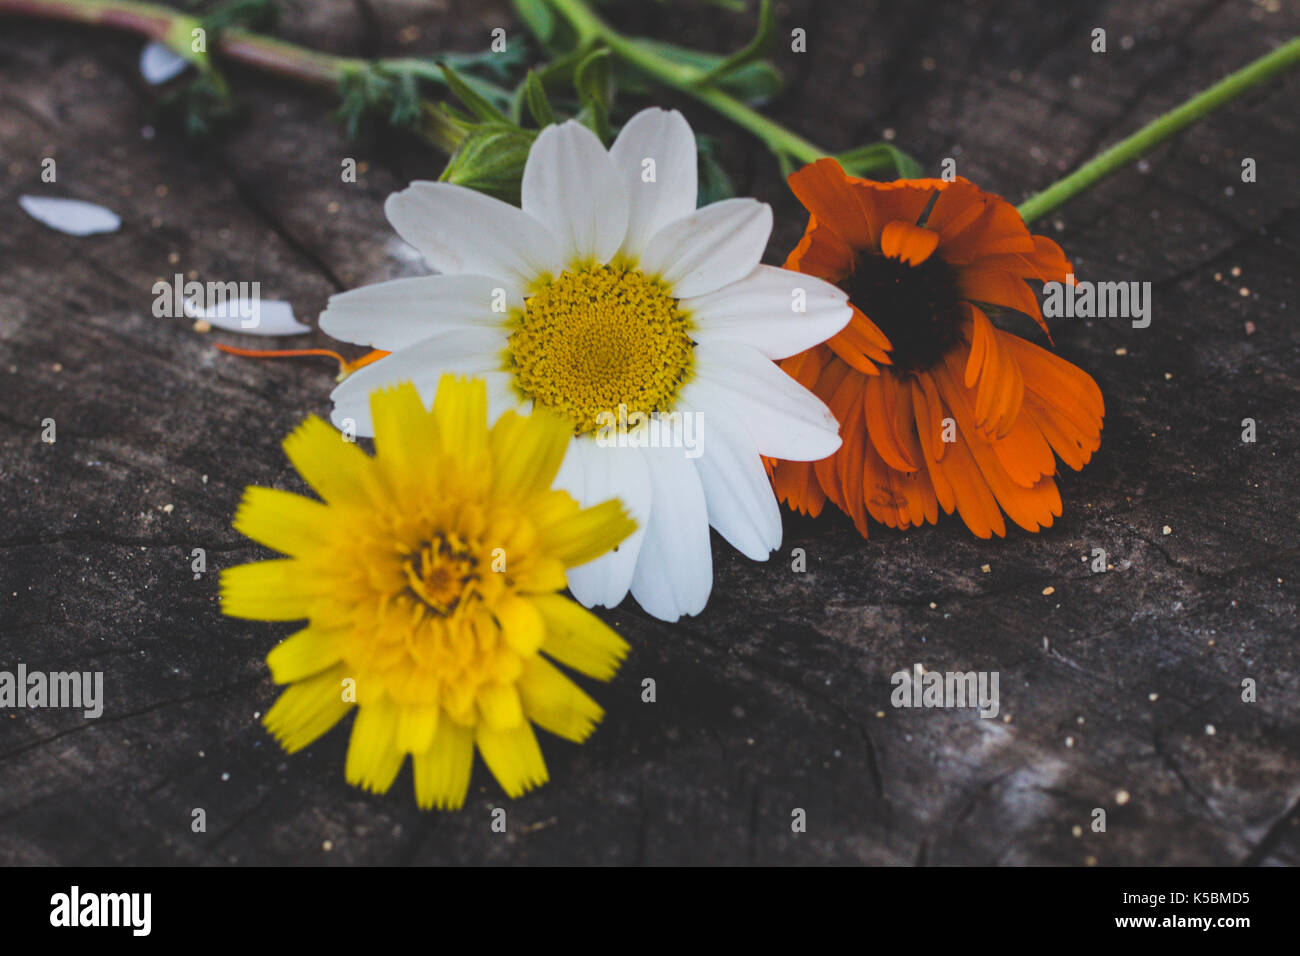 Flores De Colores Sobre Fondos De Madera Foto Imagen De Stock